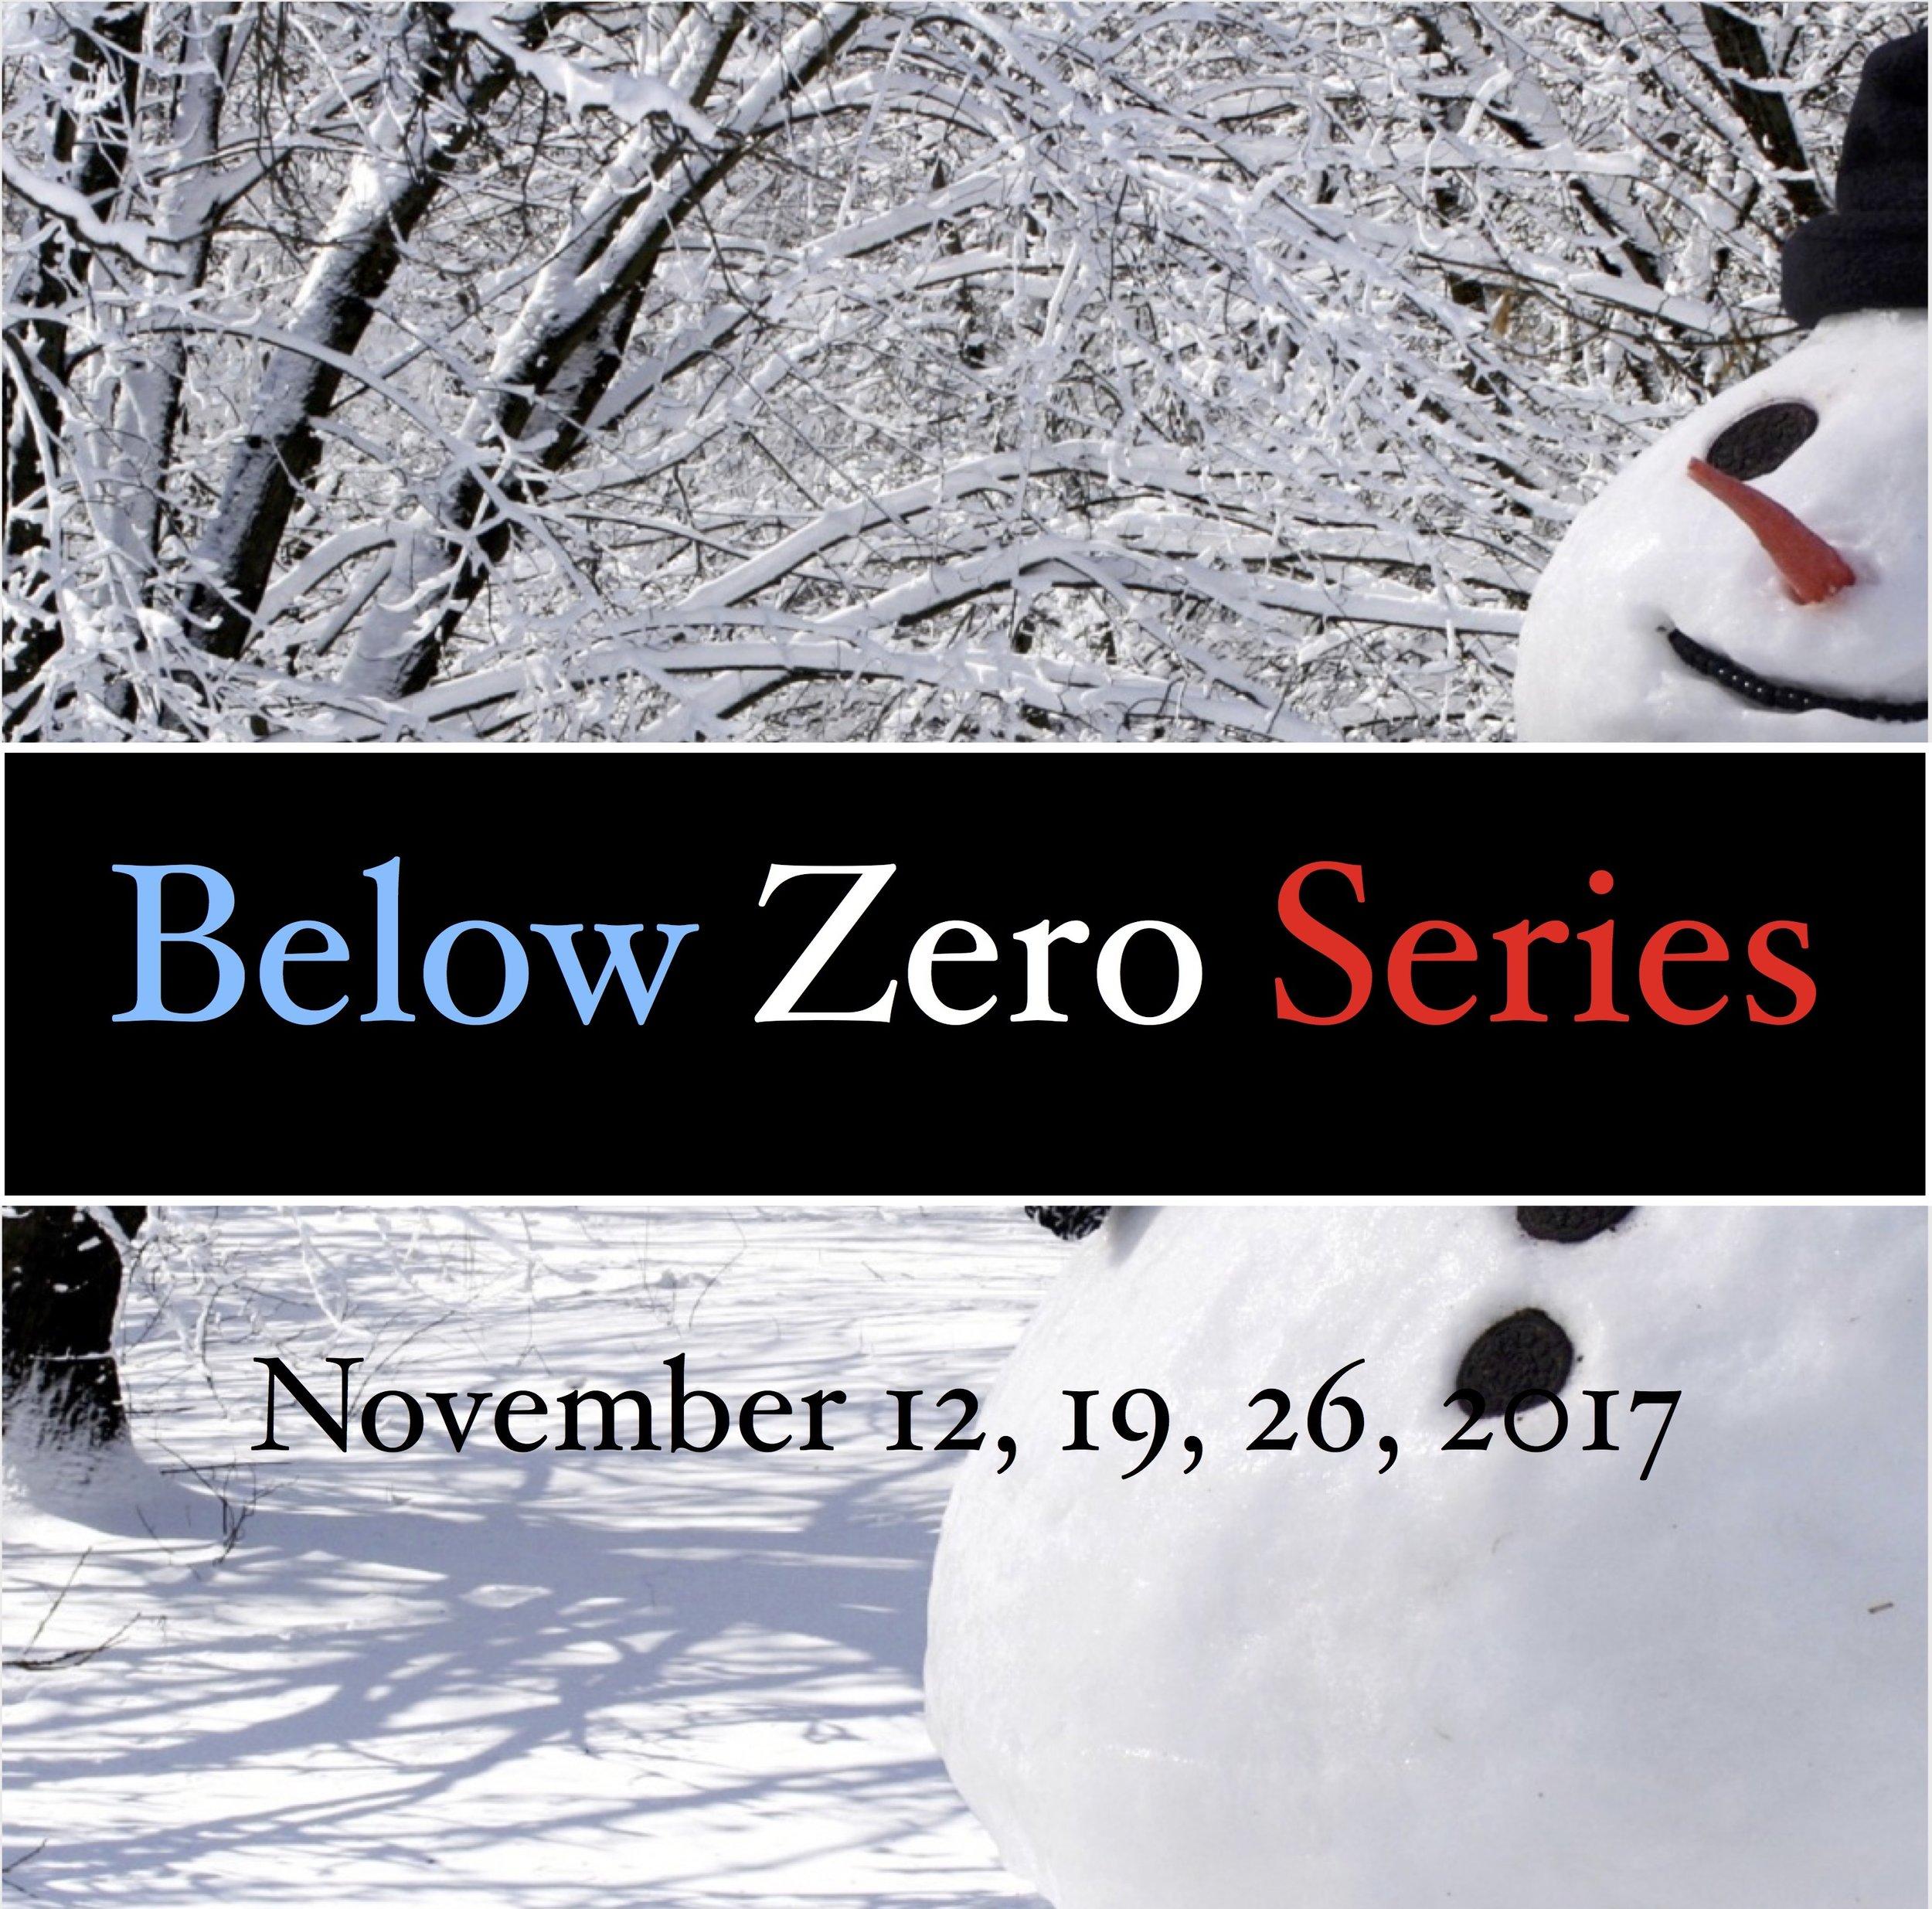 Below Zero 1 JPG.jpg